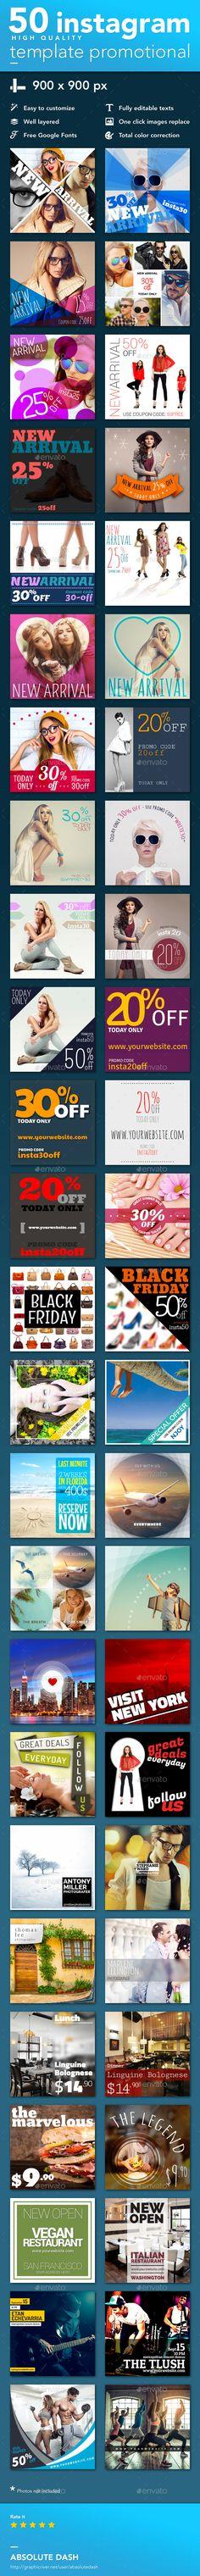 Instagram Banner Design Template Promotional - Social Media Web Template PSD. Download here: http://graphicriver.net/item/instagram-template-promotional/16539643?ref=yinkira